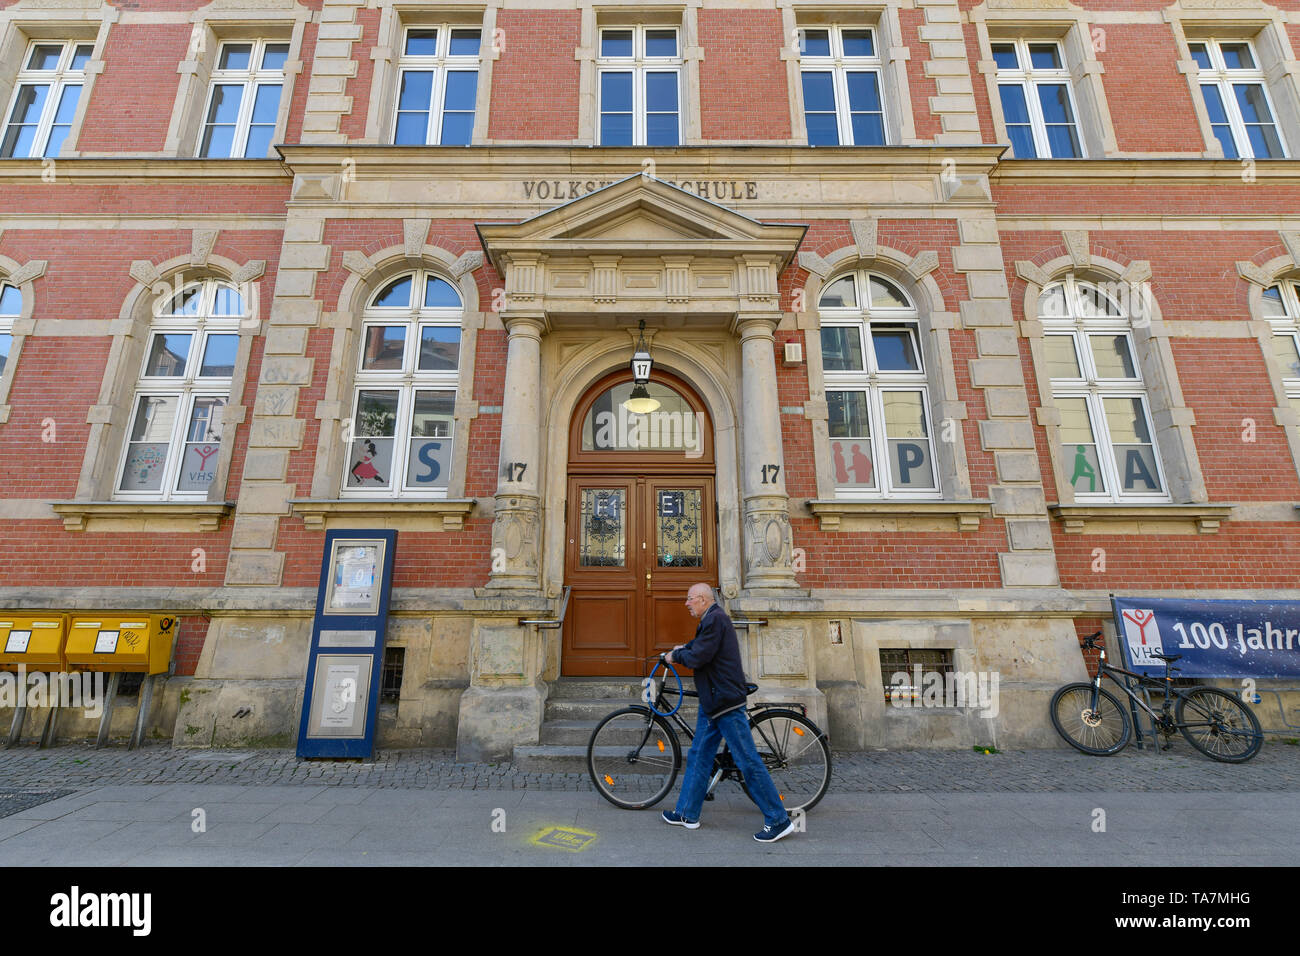 Adult education programme, Carl apron street, Old Town, Spandau, Berlin, Germany, Volkshochschule, Carl-Schurz-Straße, Altstadt, Deutschland - Stock Image